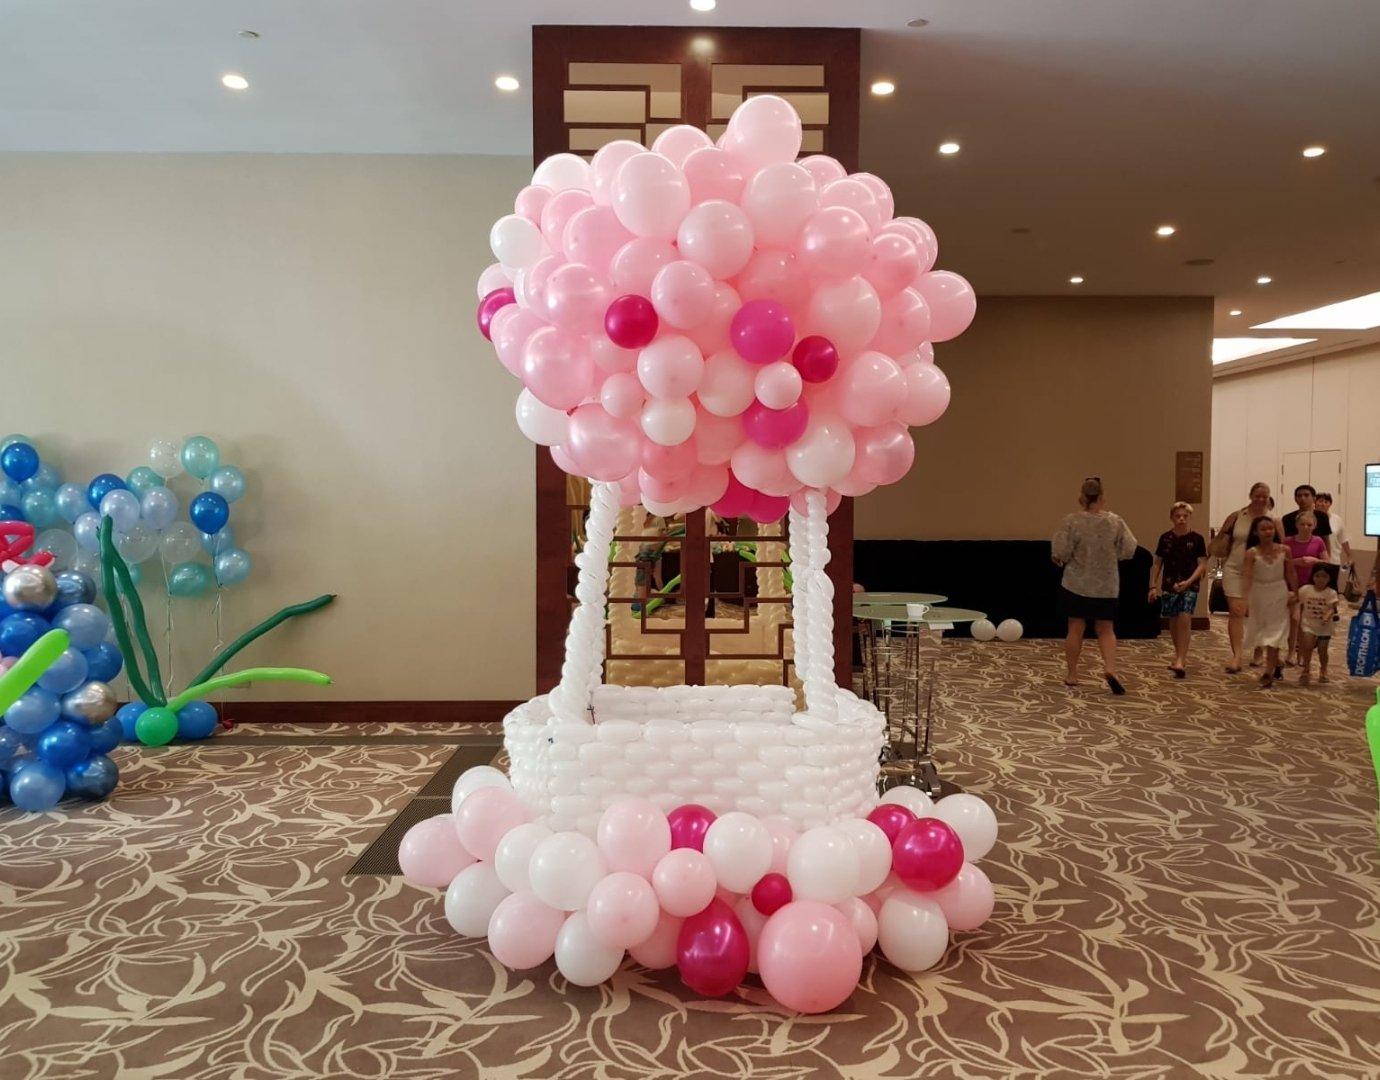 Organic Hot Air Balloon Sculpture Display